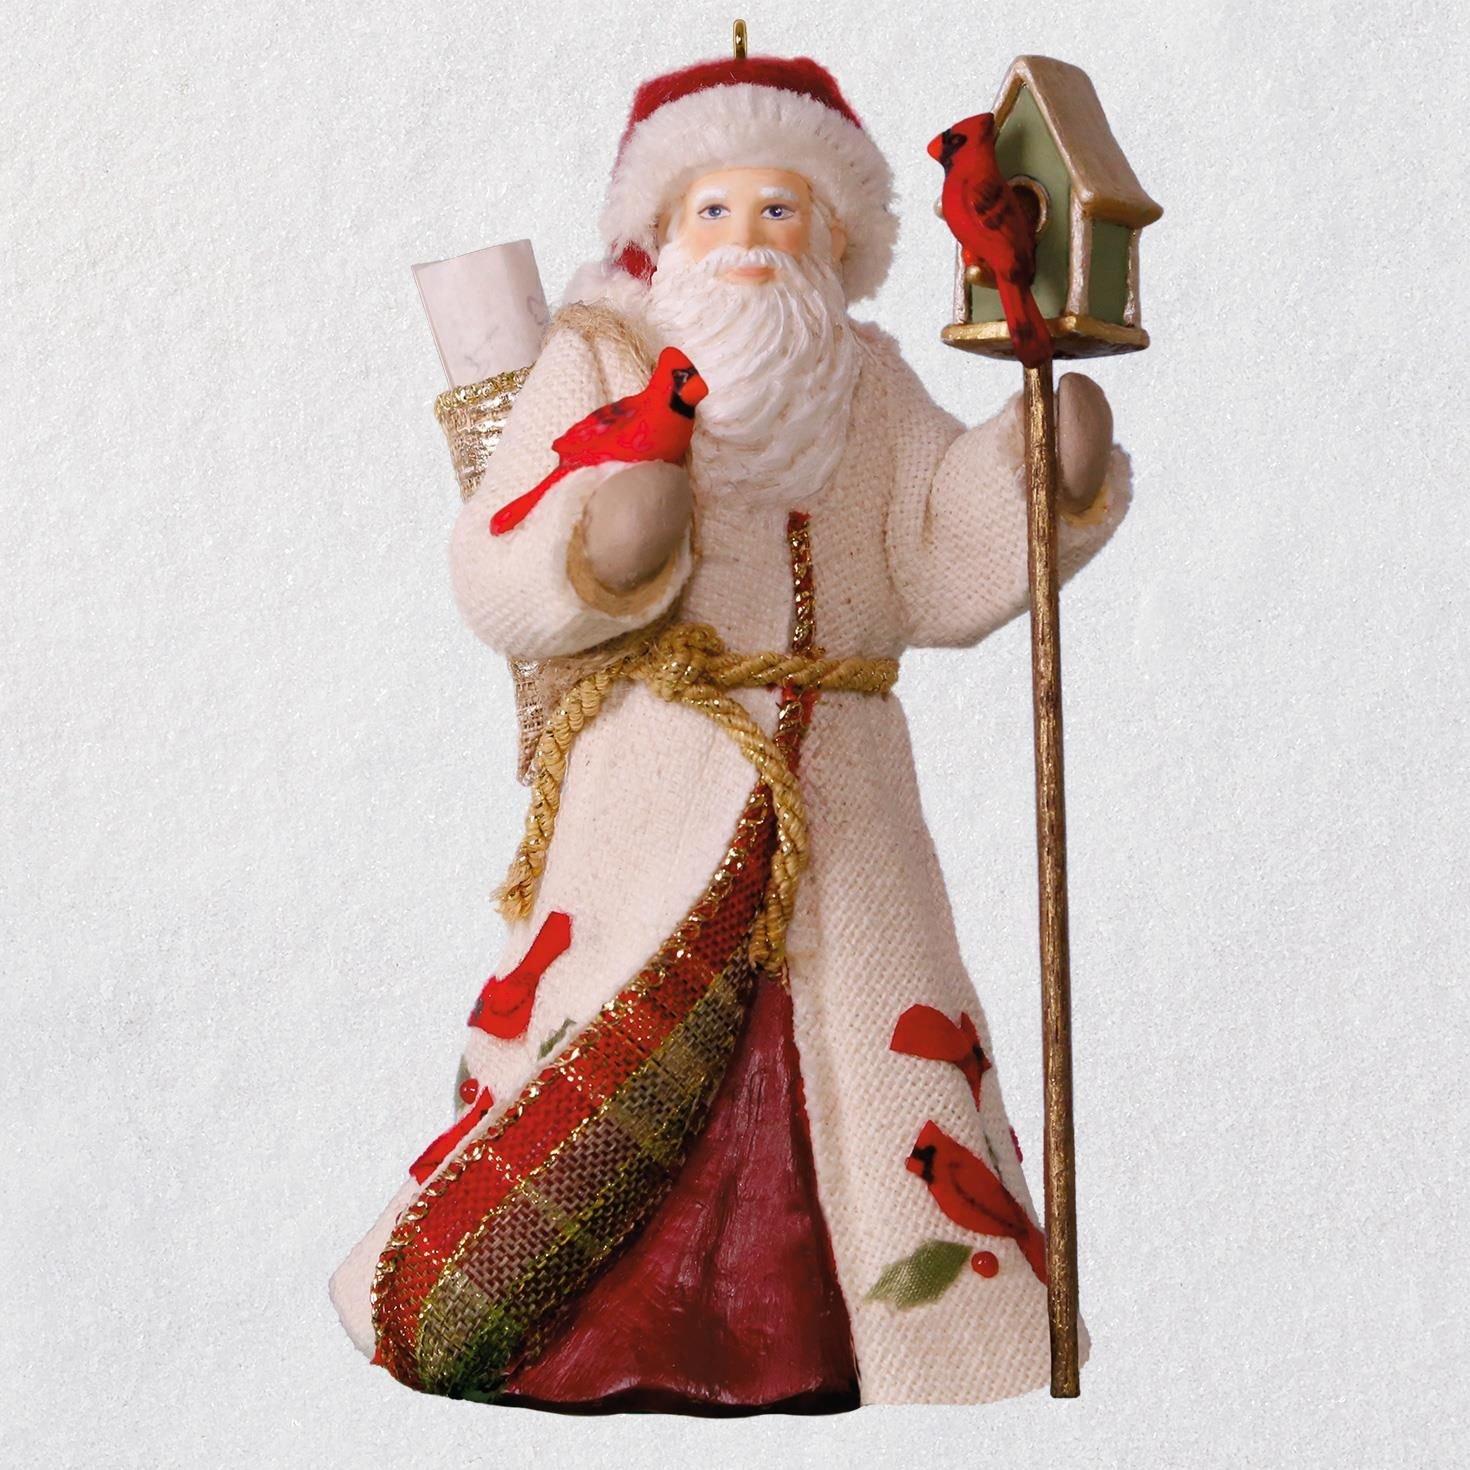 Happy Memories Father Christmas Ornament keepsake-ornaments Santa Claus